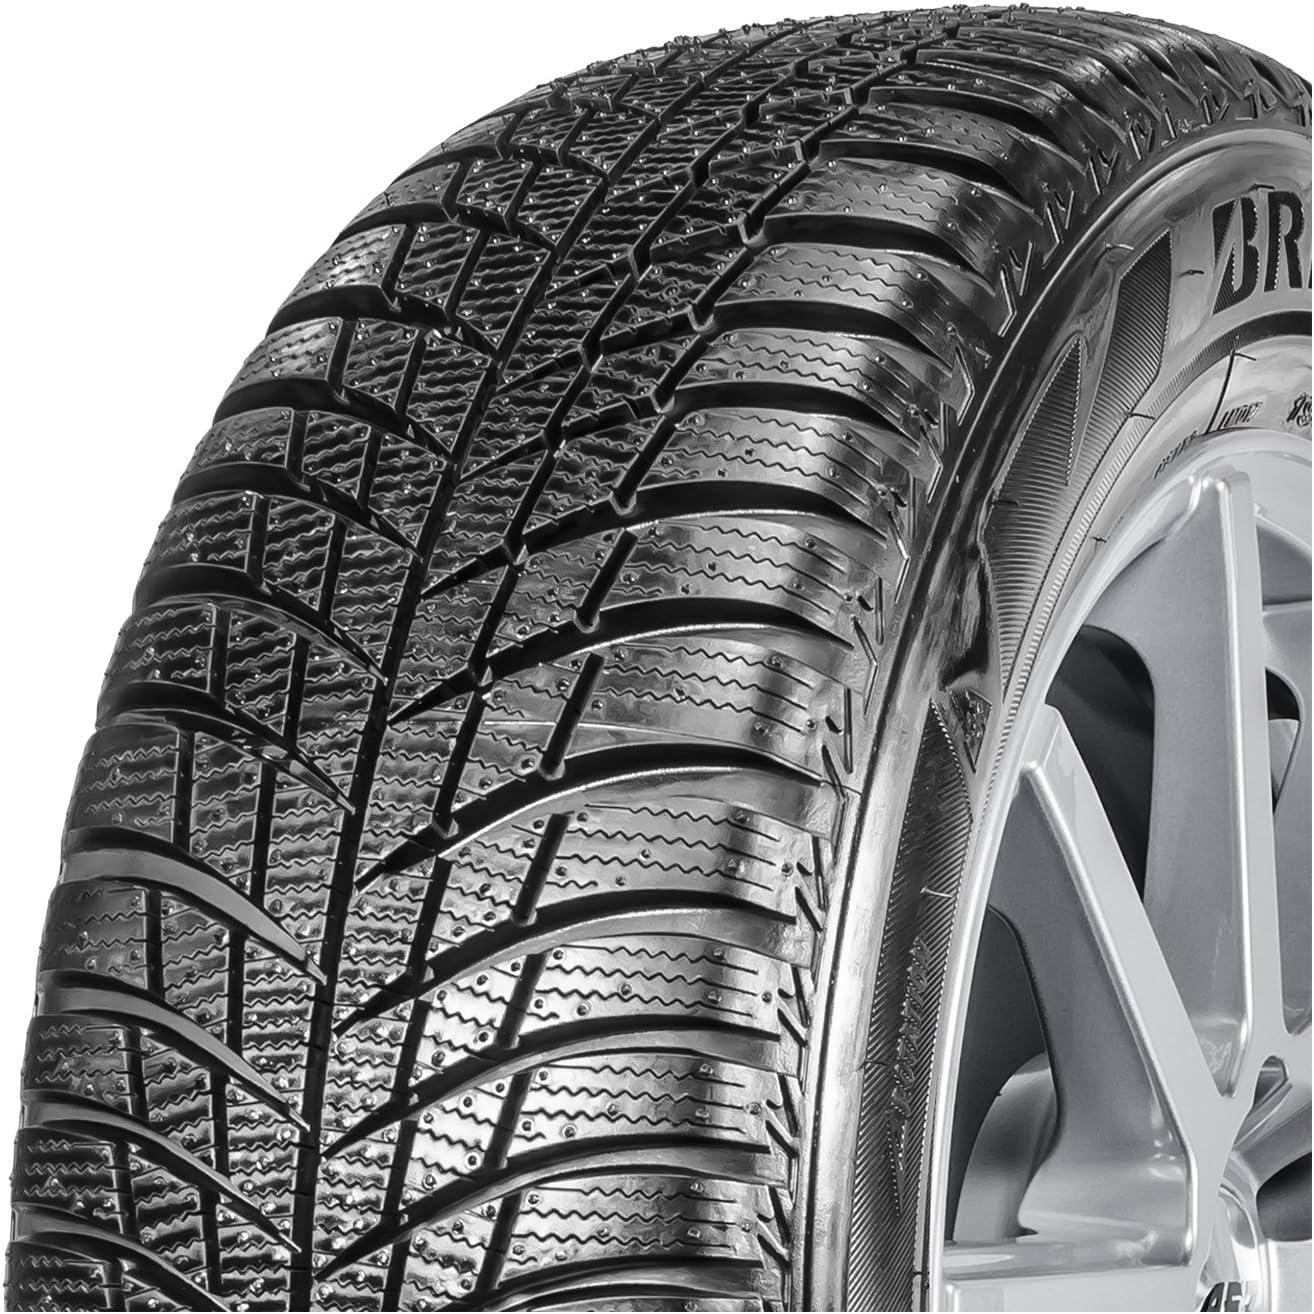 Bridgestone Blizzak Lm 001 M S 225 50r18 95h Winterreifen Auto